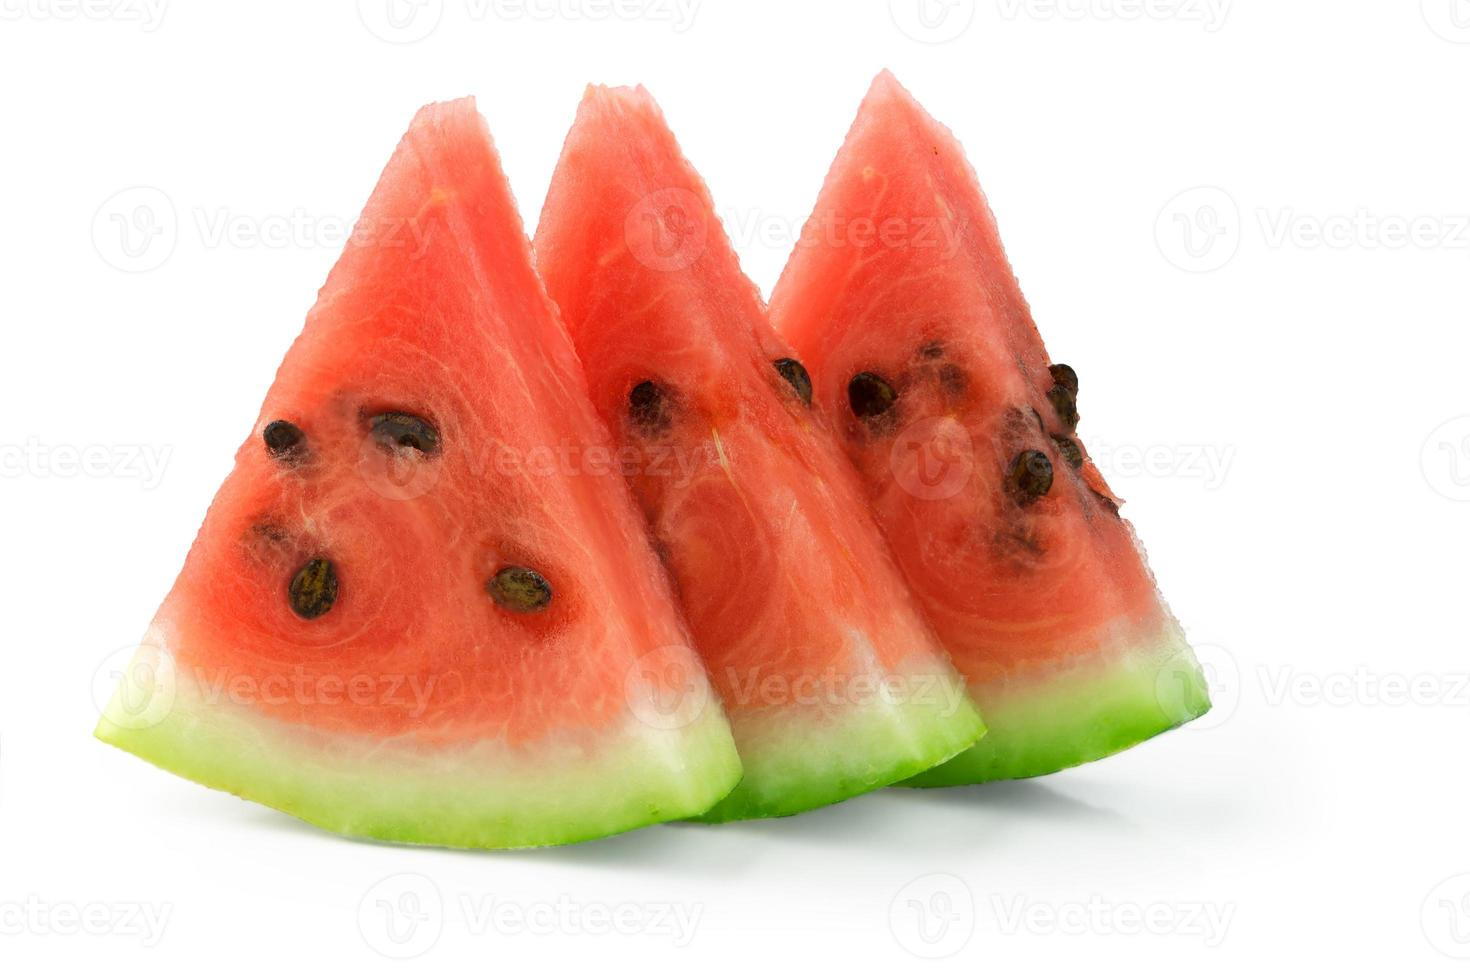 melancia fatiada foto